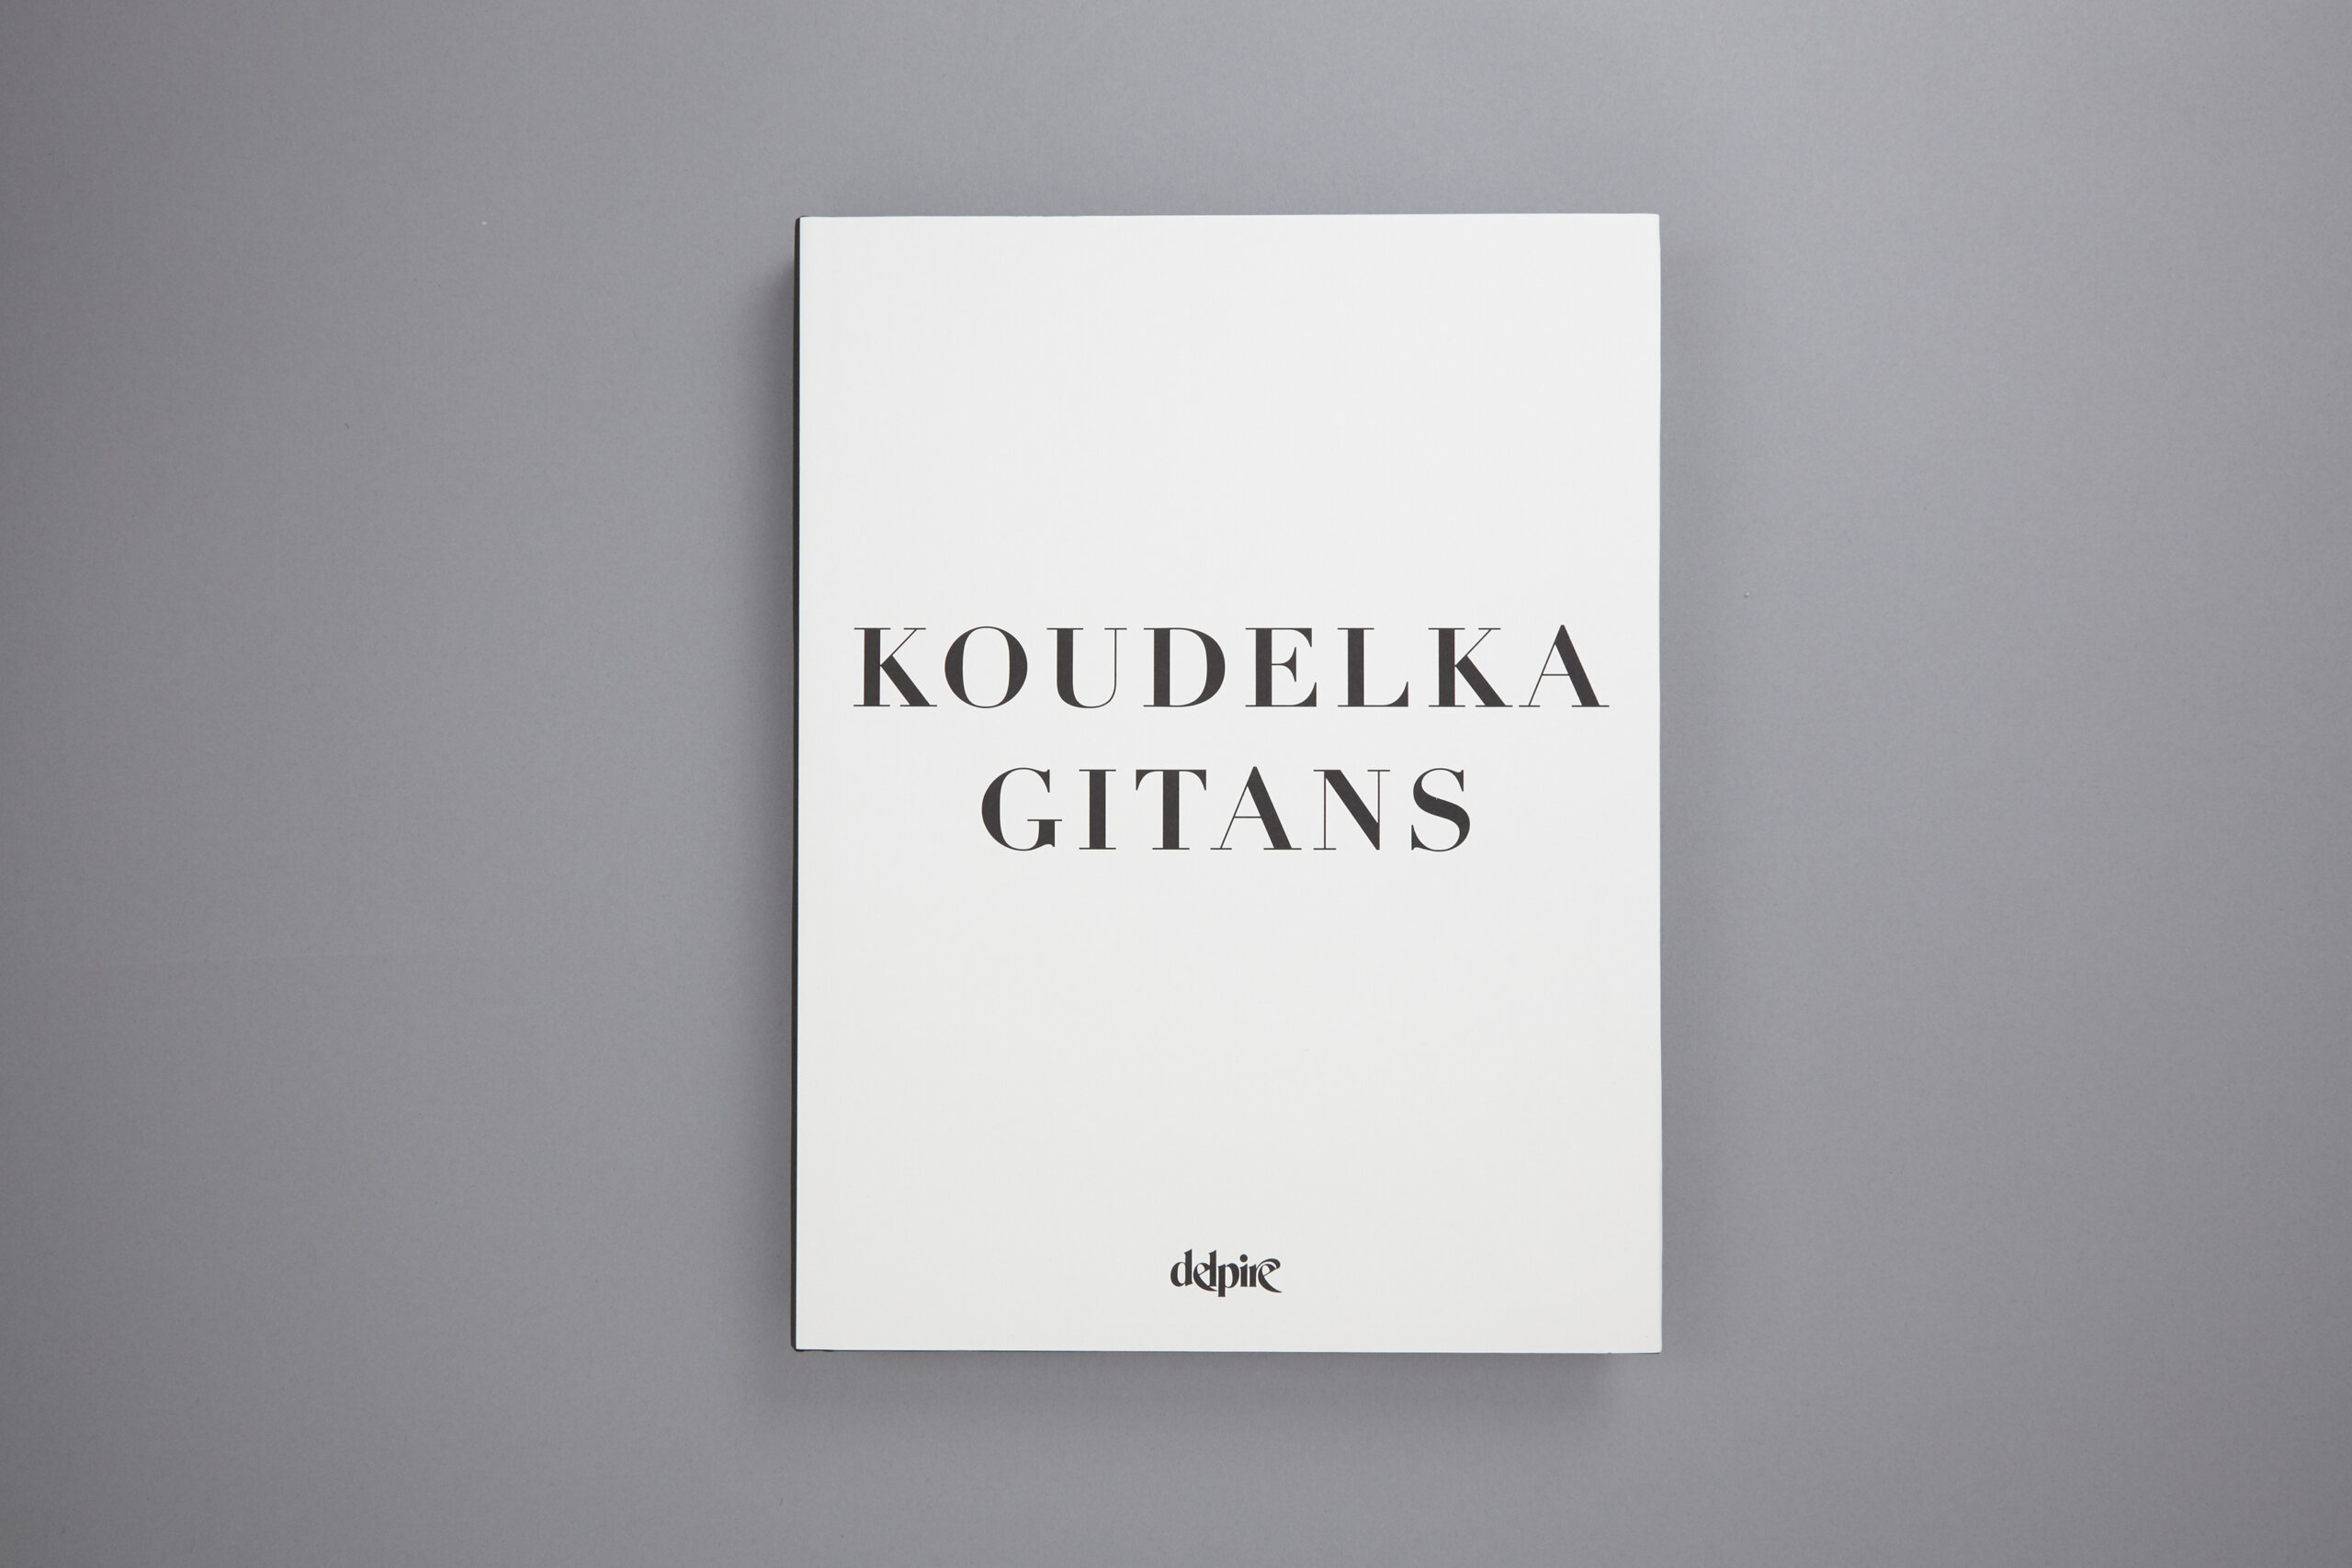 delpire-KOUDELKA-josef-gitans-001couverture